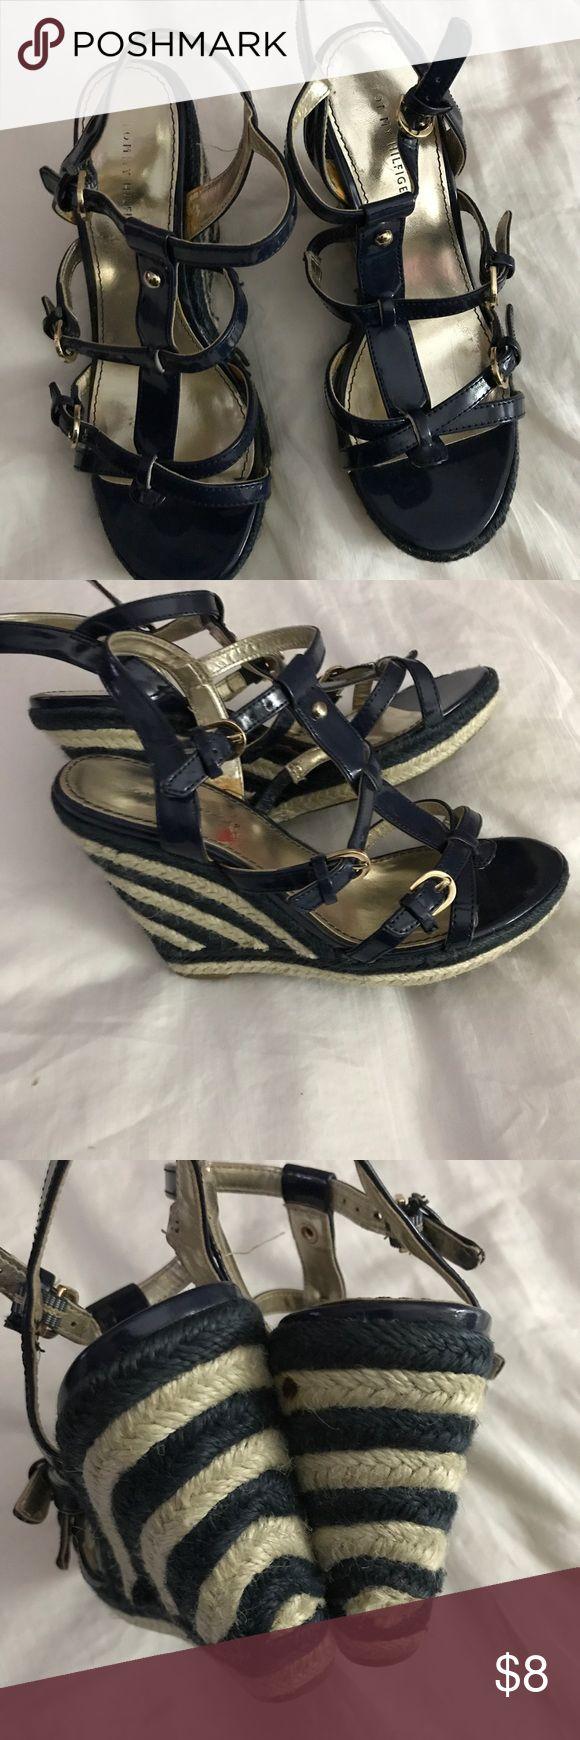 Tommy Hilfiger Espadrille Sandals Cute navy and jute  sandals Tommy Hilfiger Shoes Sandals